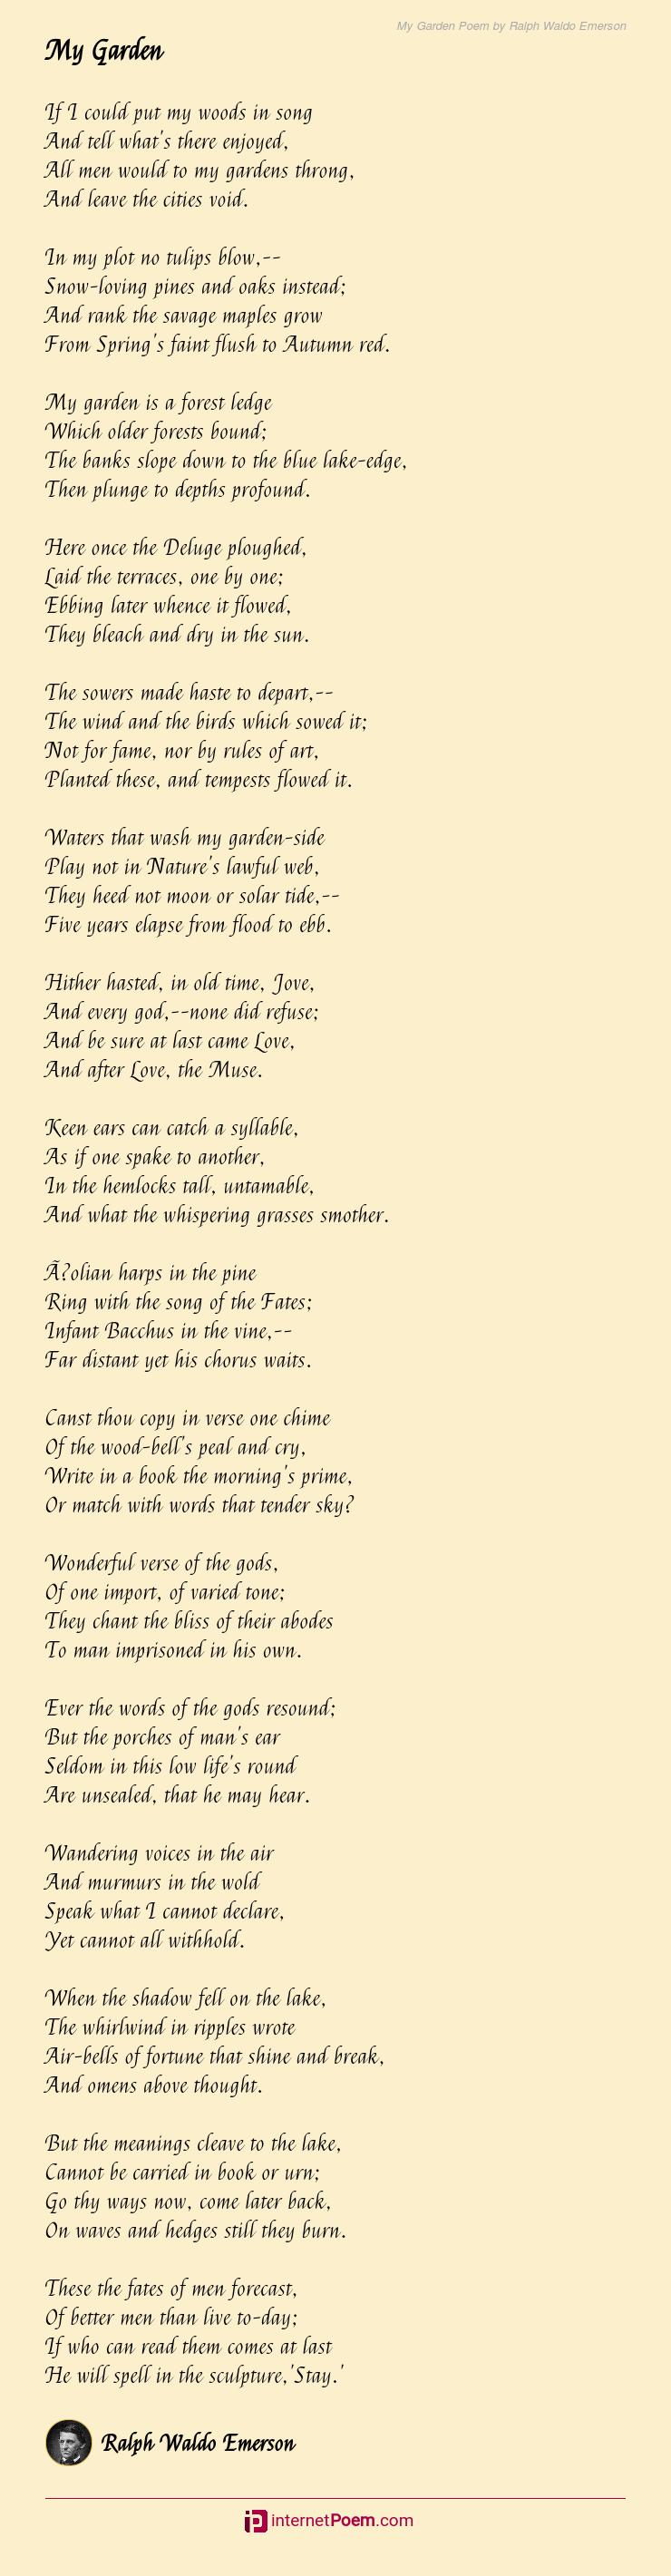 My Garden Poem By Ralph Waldo Emerson